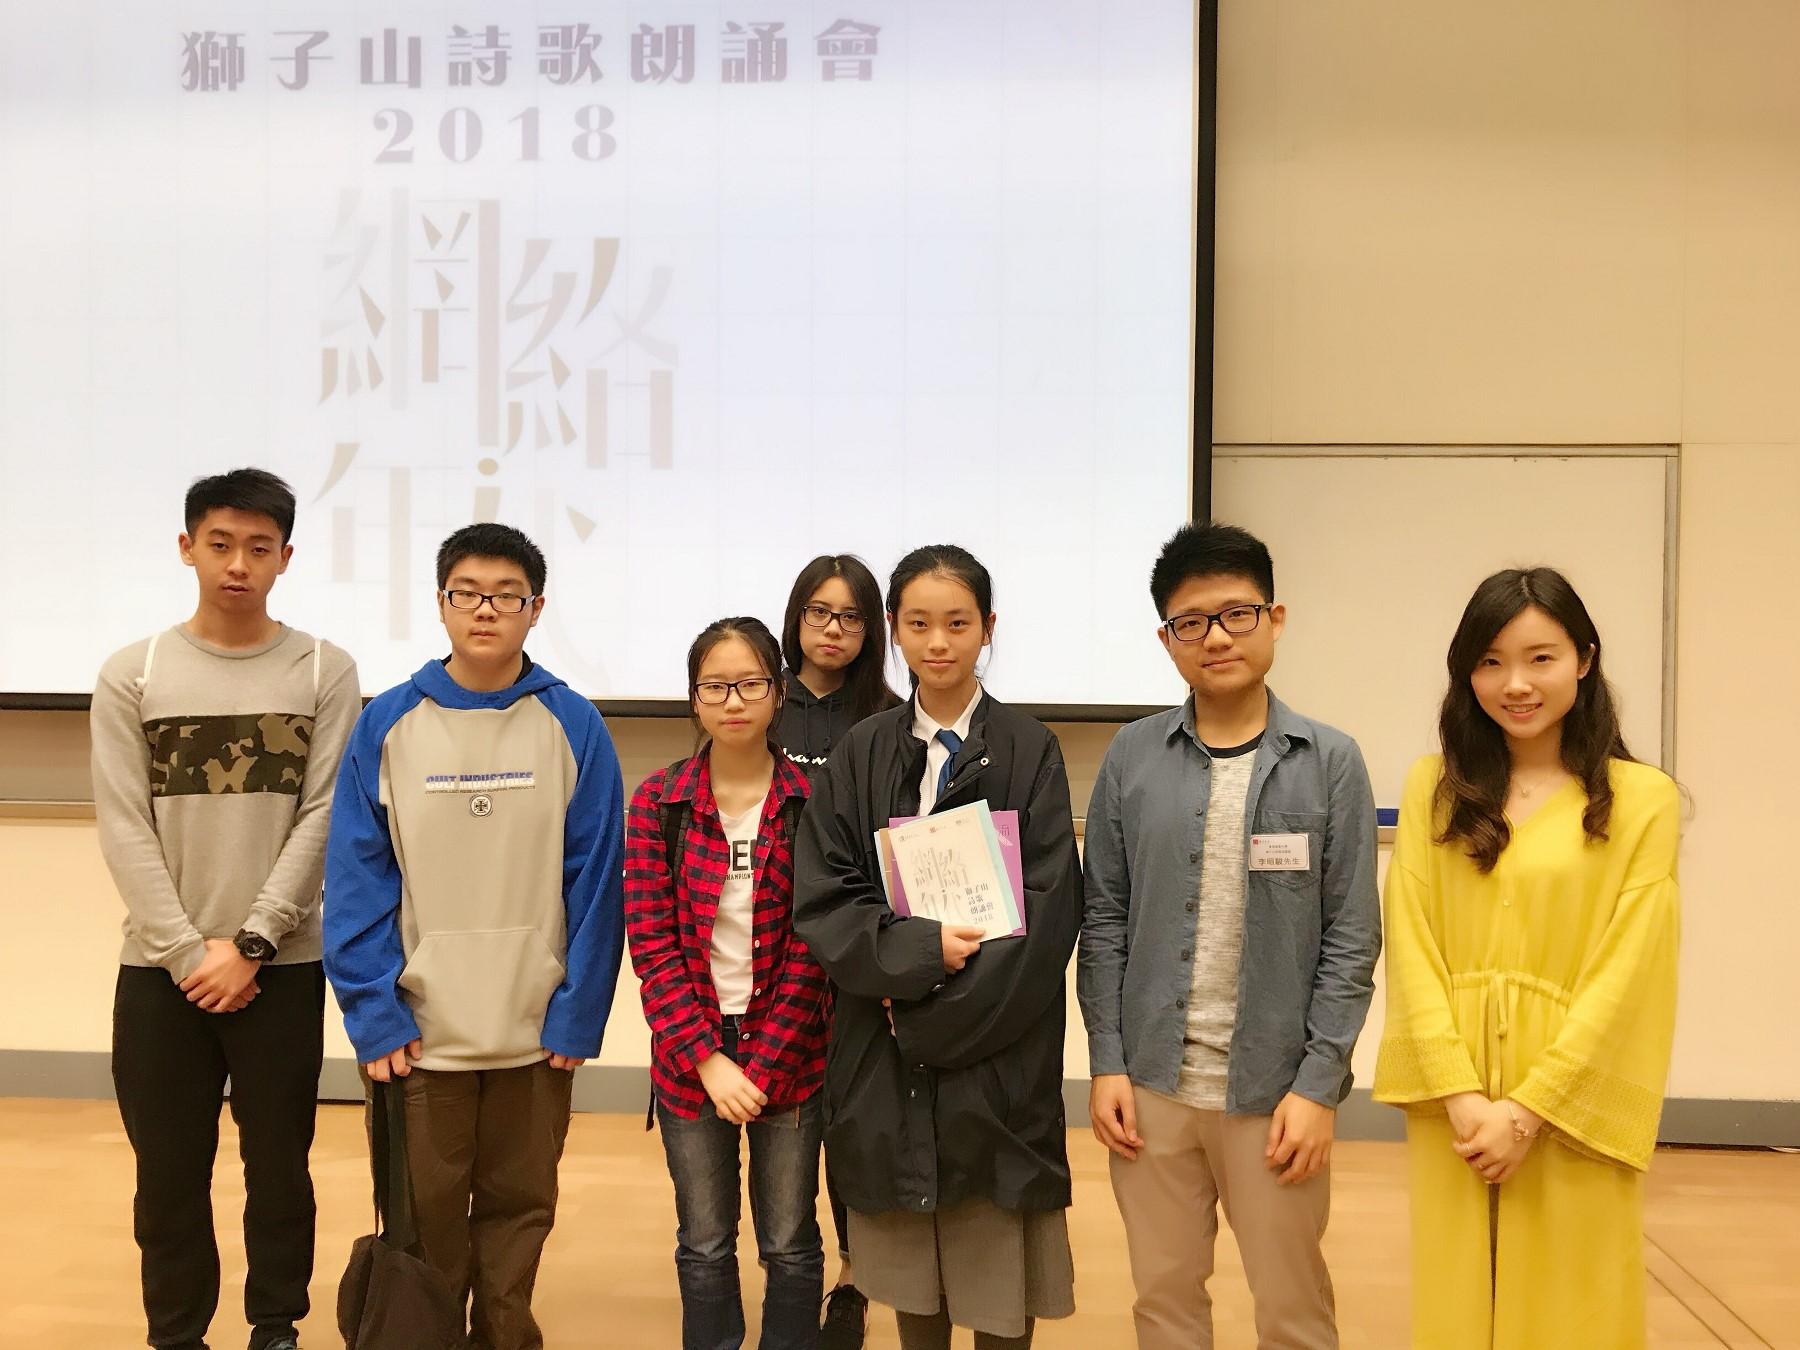 https://www.npc.edu.hk/sites/default/files/img_6224.jpeg